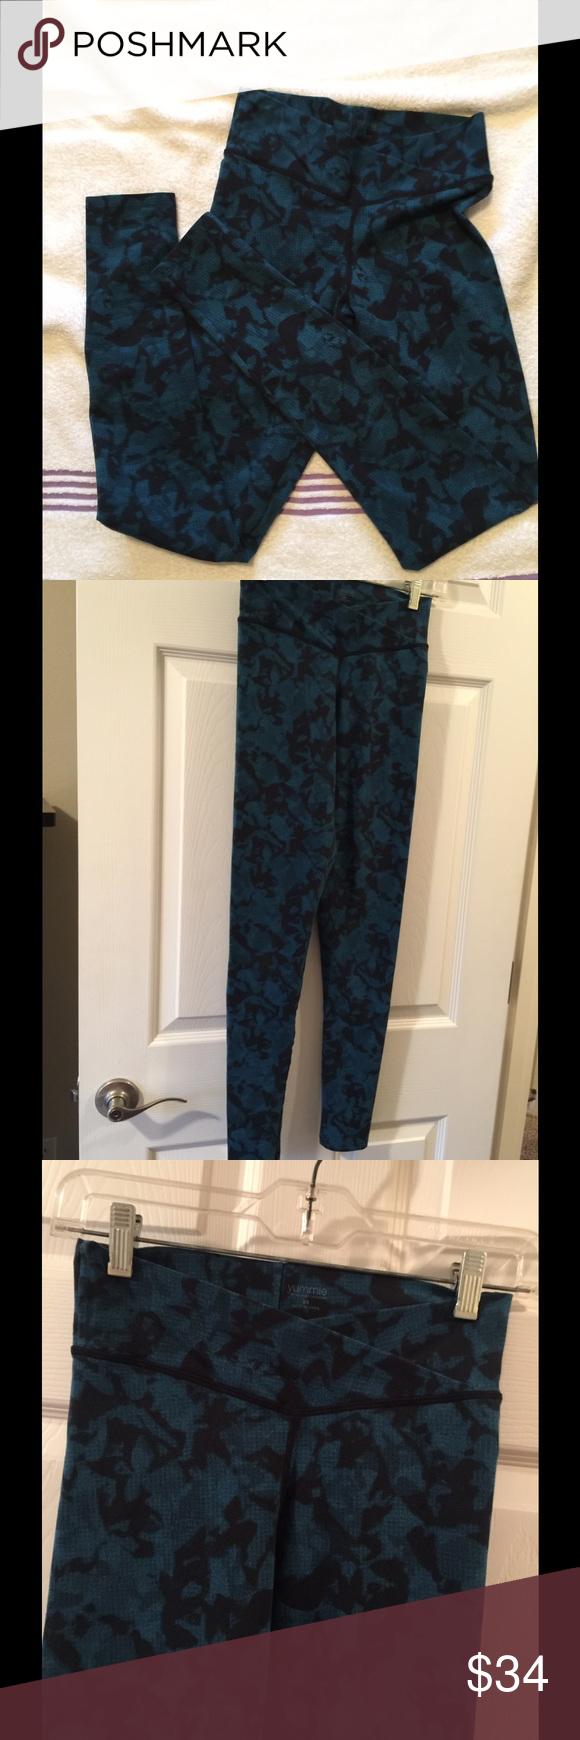 Yummie Leggings XS blue/black Excellent yoga tights  Hannah leggings XS $78 Yummie by Heather Thomson Pants Leggings